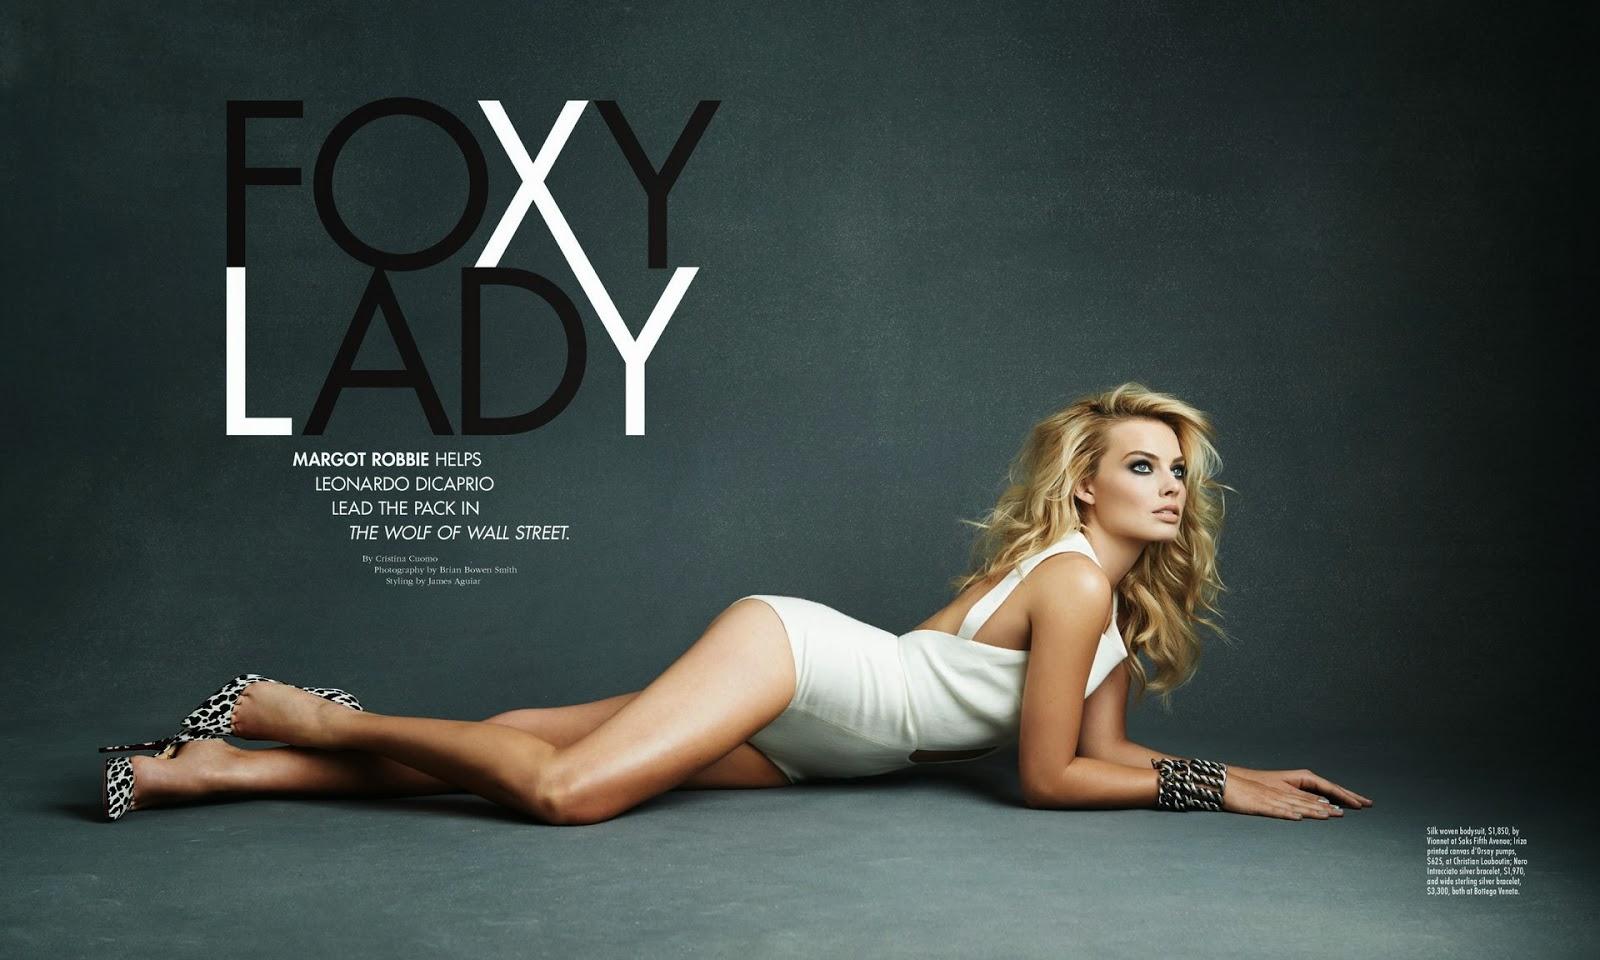 Magazine Photoshoot : Margot Robbie Photoshot For Manhattan Magazine January / February 2014 Issue